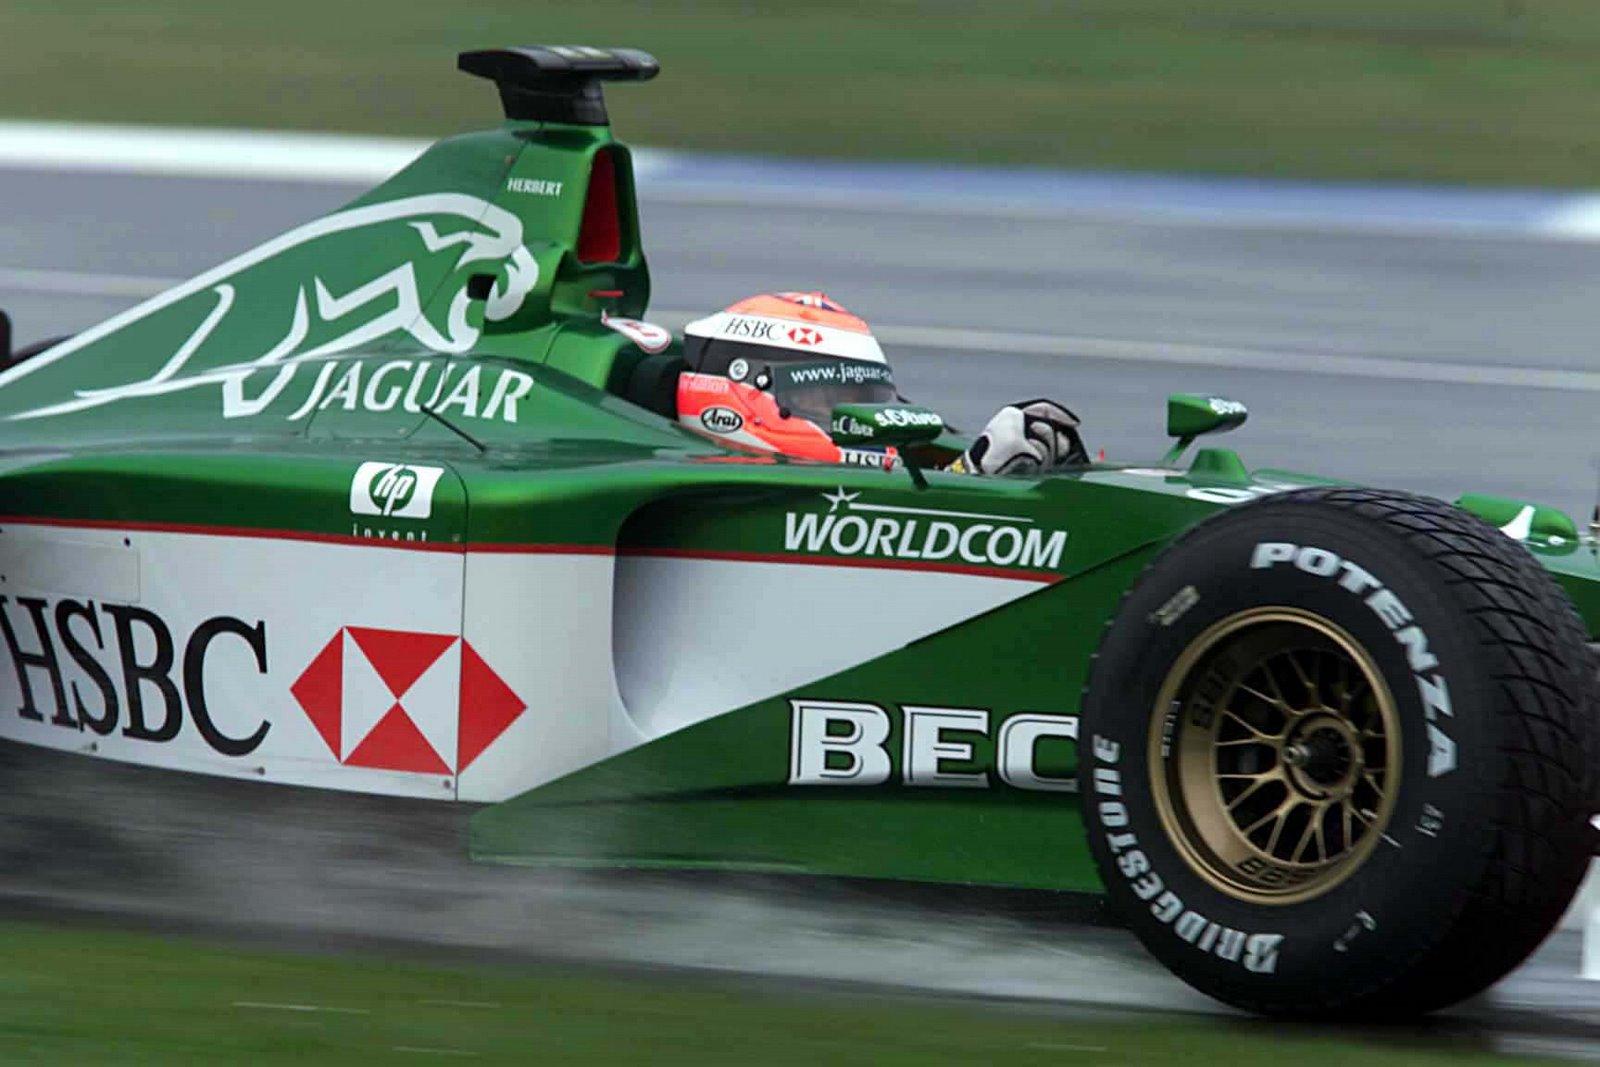 04 British Grand Prix United Kingdom Silverstone Circuit, Silverstone Great Britain 2000 Johnn...jpg